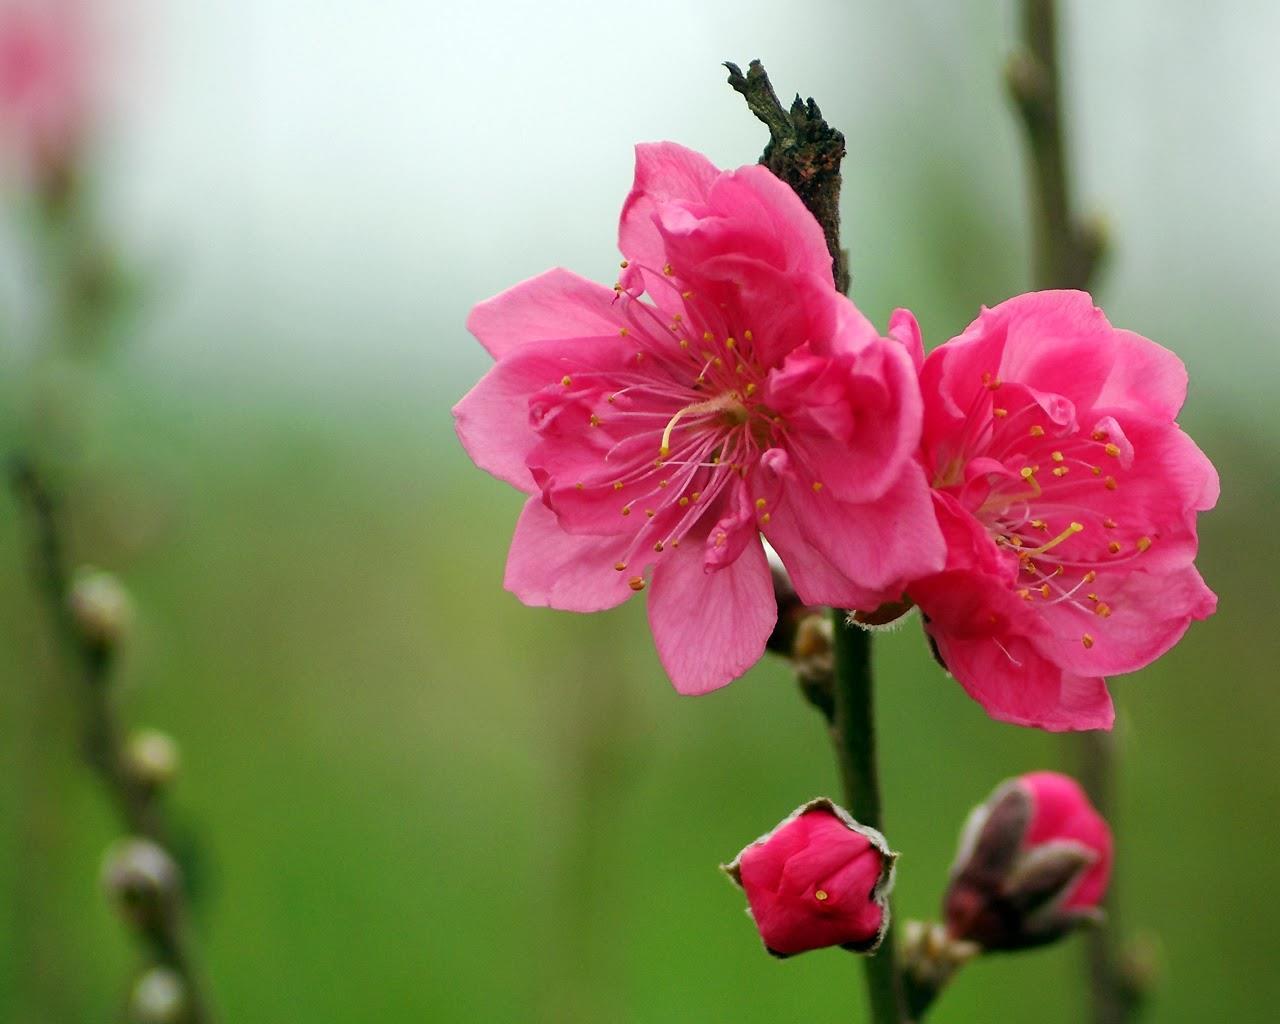 van chuyen hoa da da lat di thanh hoa chuyen nghiep